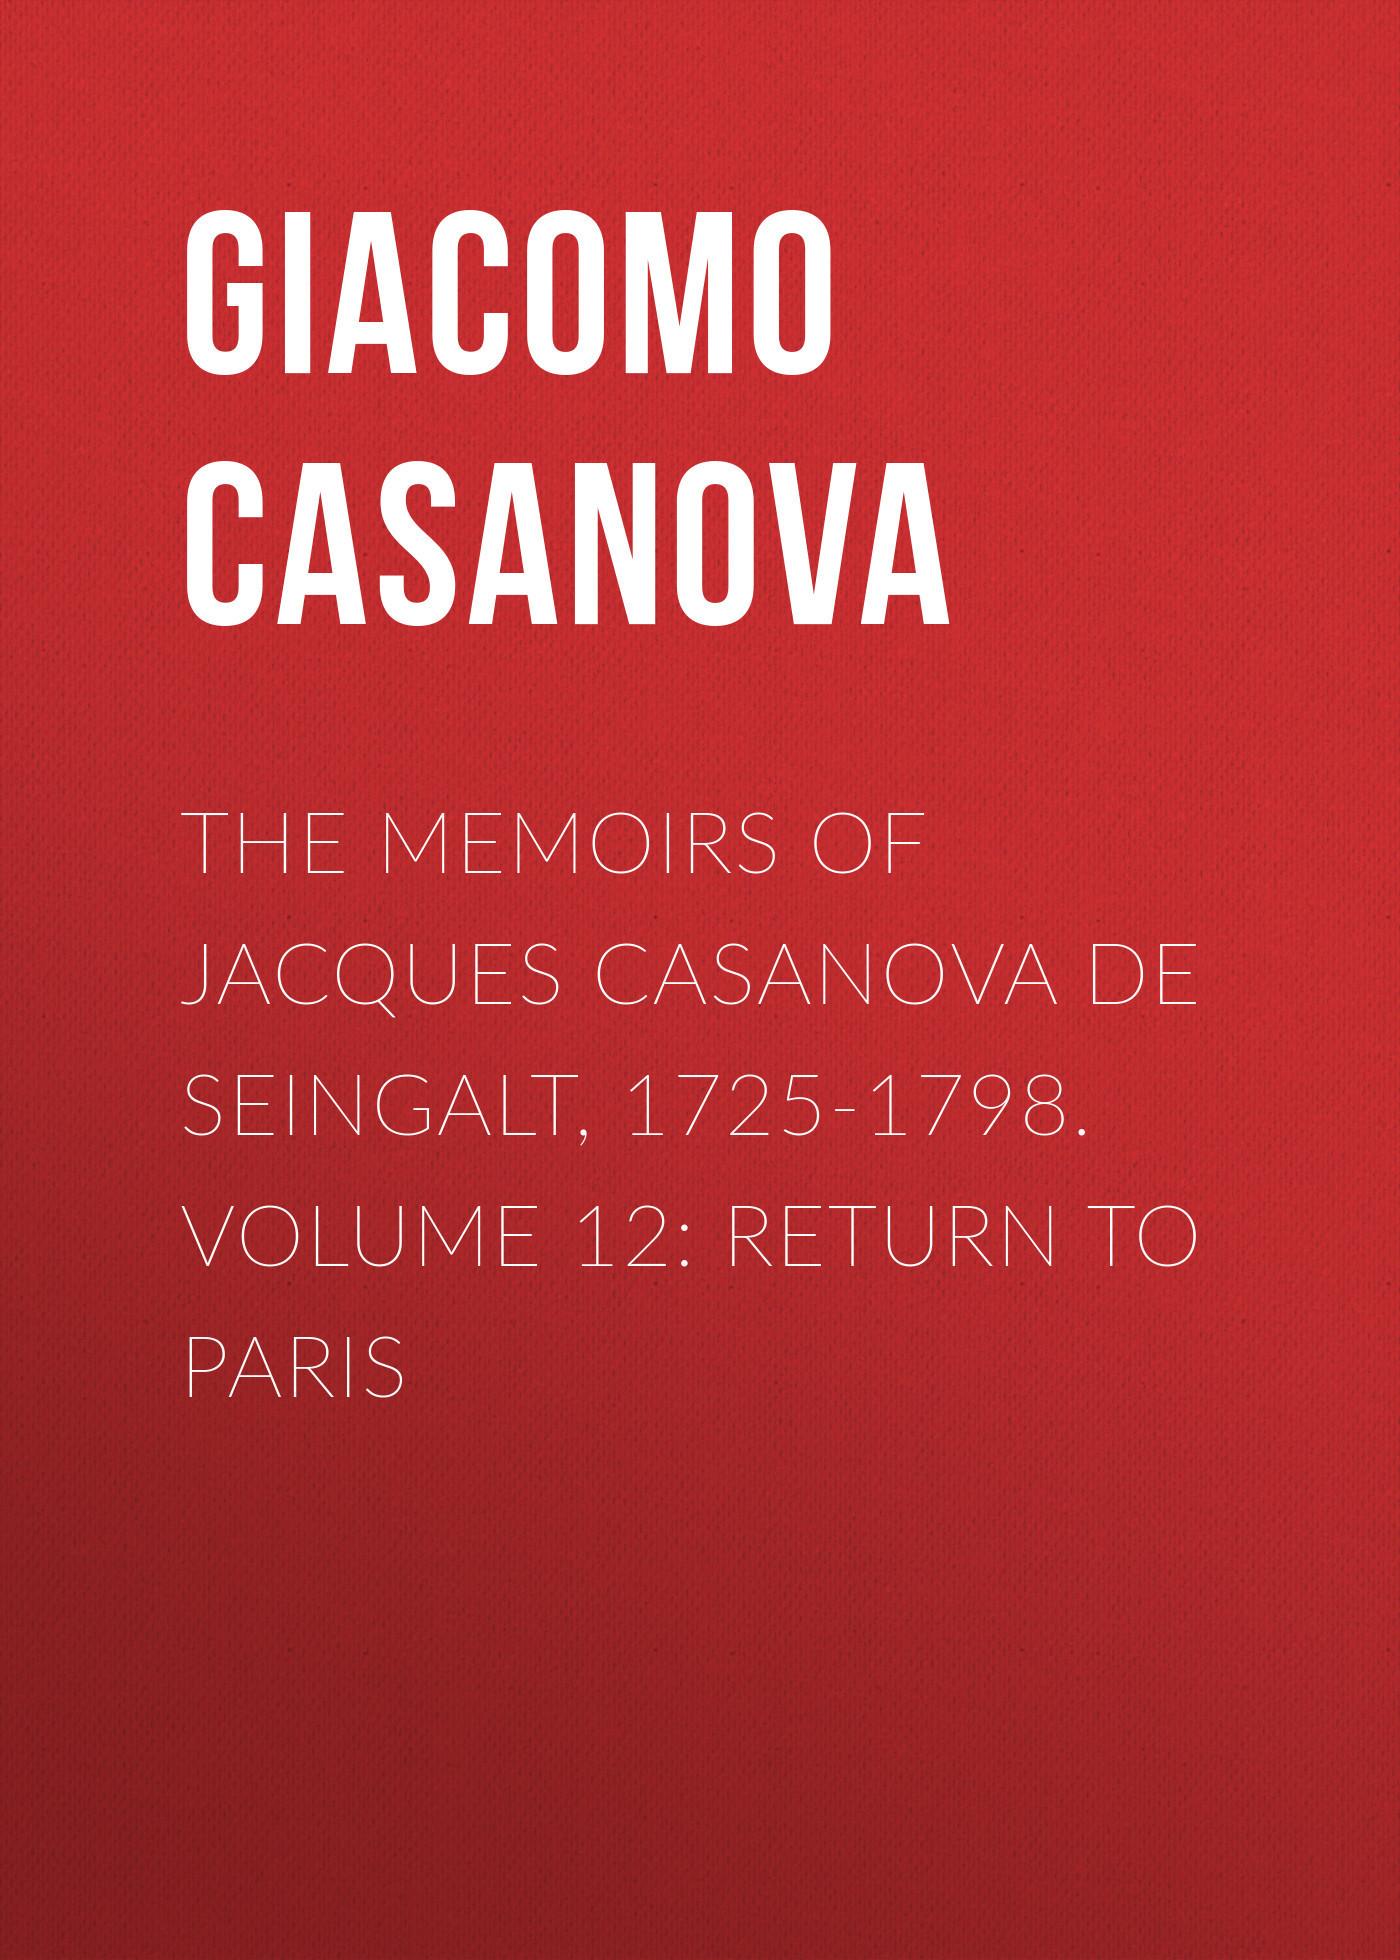 Giacomo Casanova The Memoirs of Jacques Casanova de Seingalt, 1725-1798. Volume 12: Return to Paris giacomo casanova the memoirs of jacques casanova de seingalt 1725 1798 volume 17 return to italy